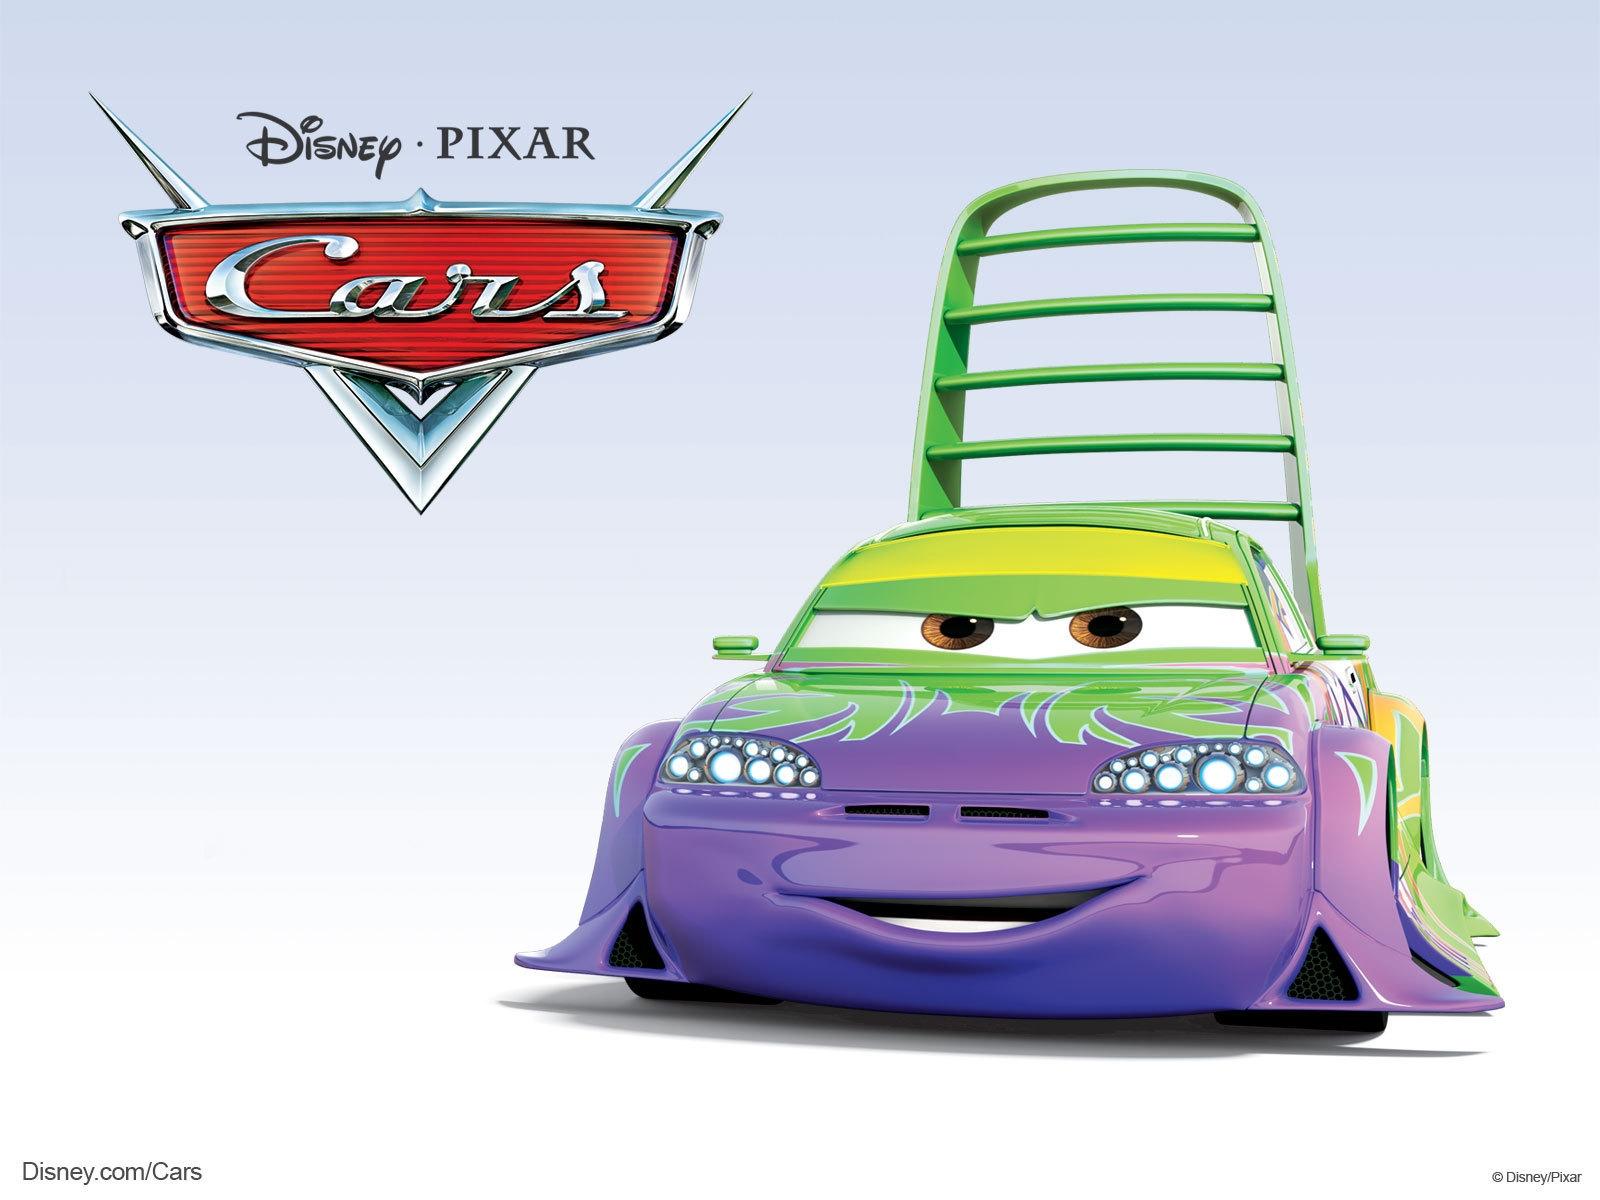 cars disney pixar cars free hd 1600 1200